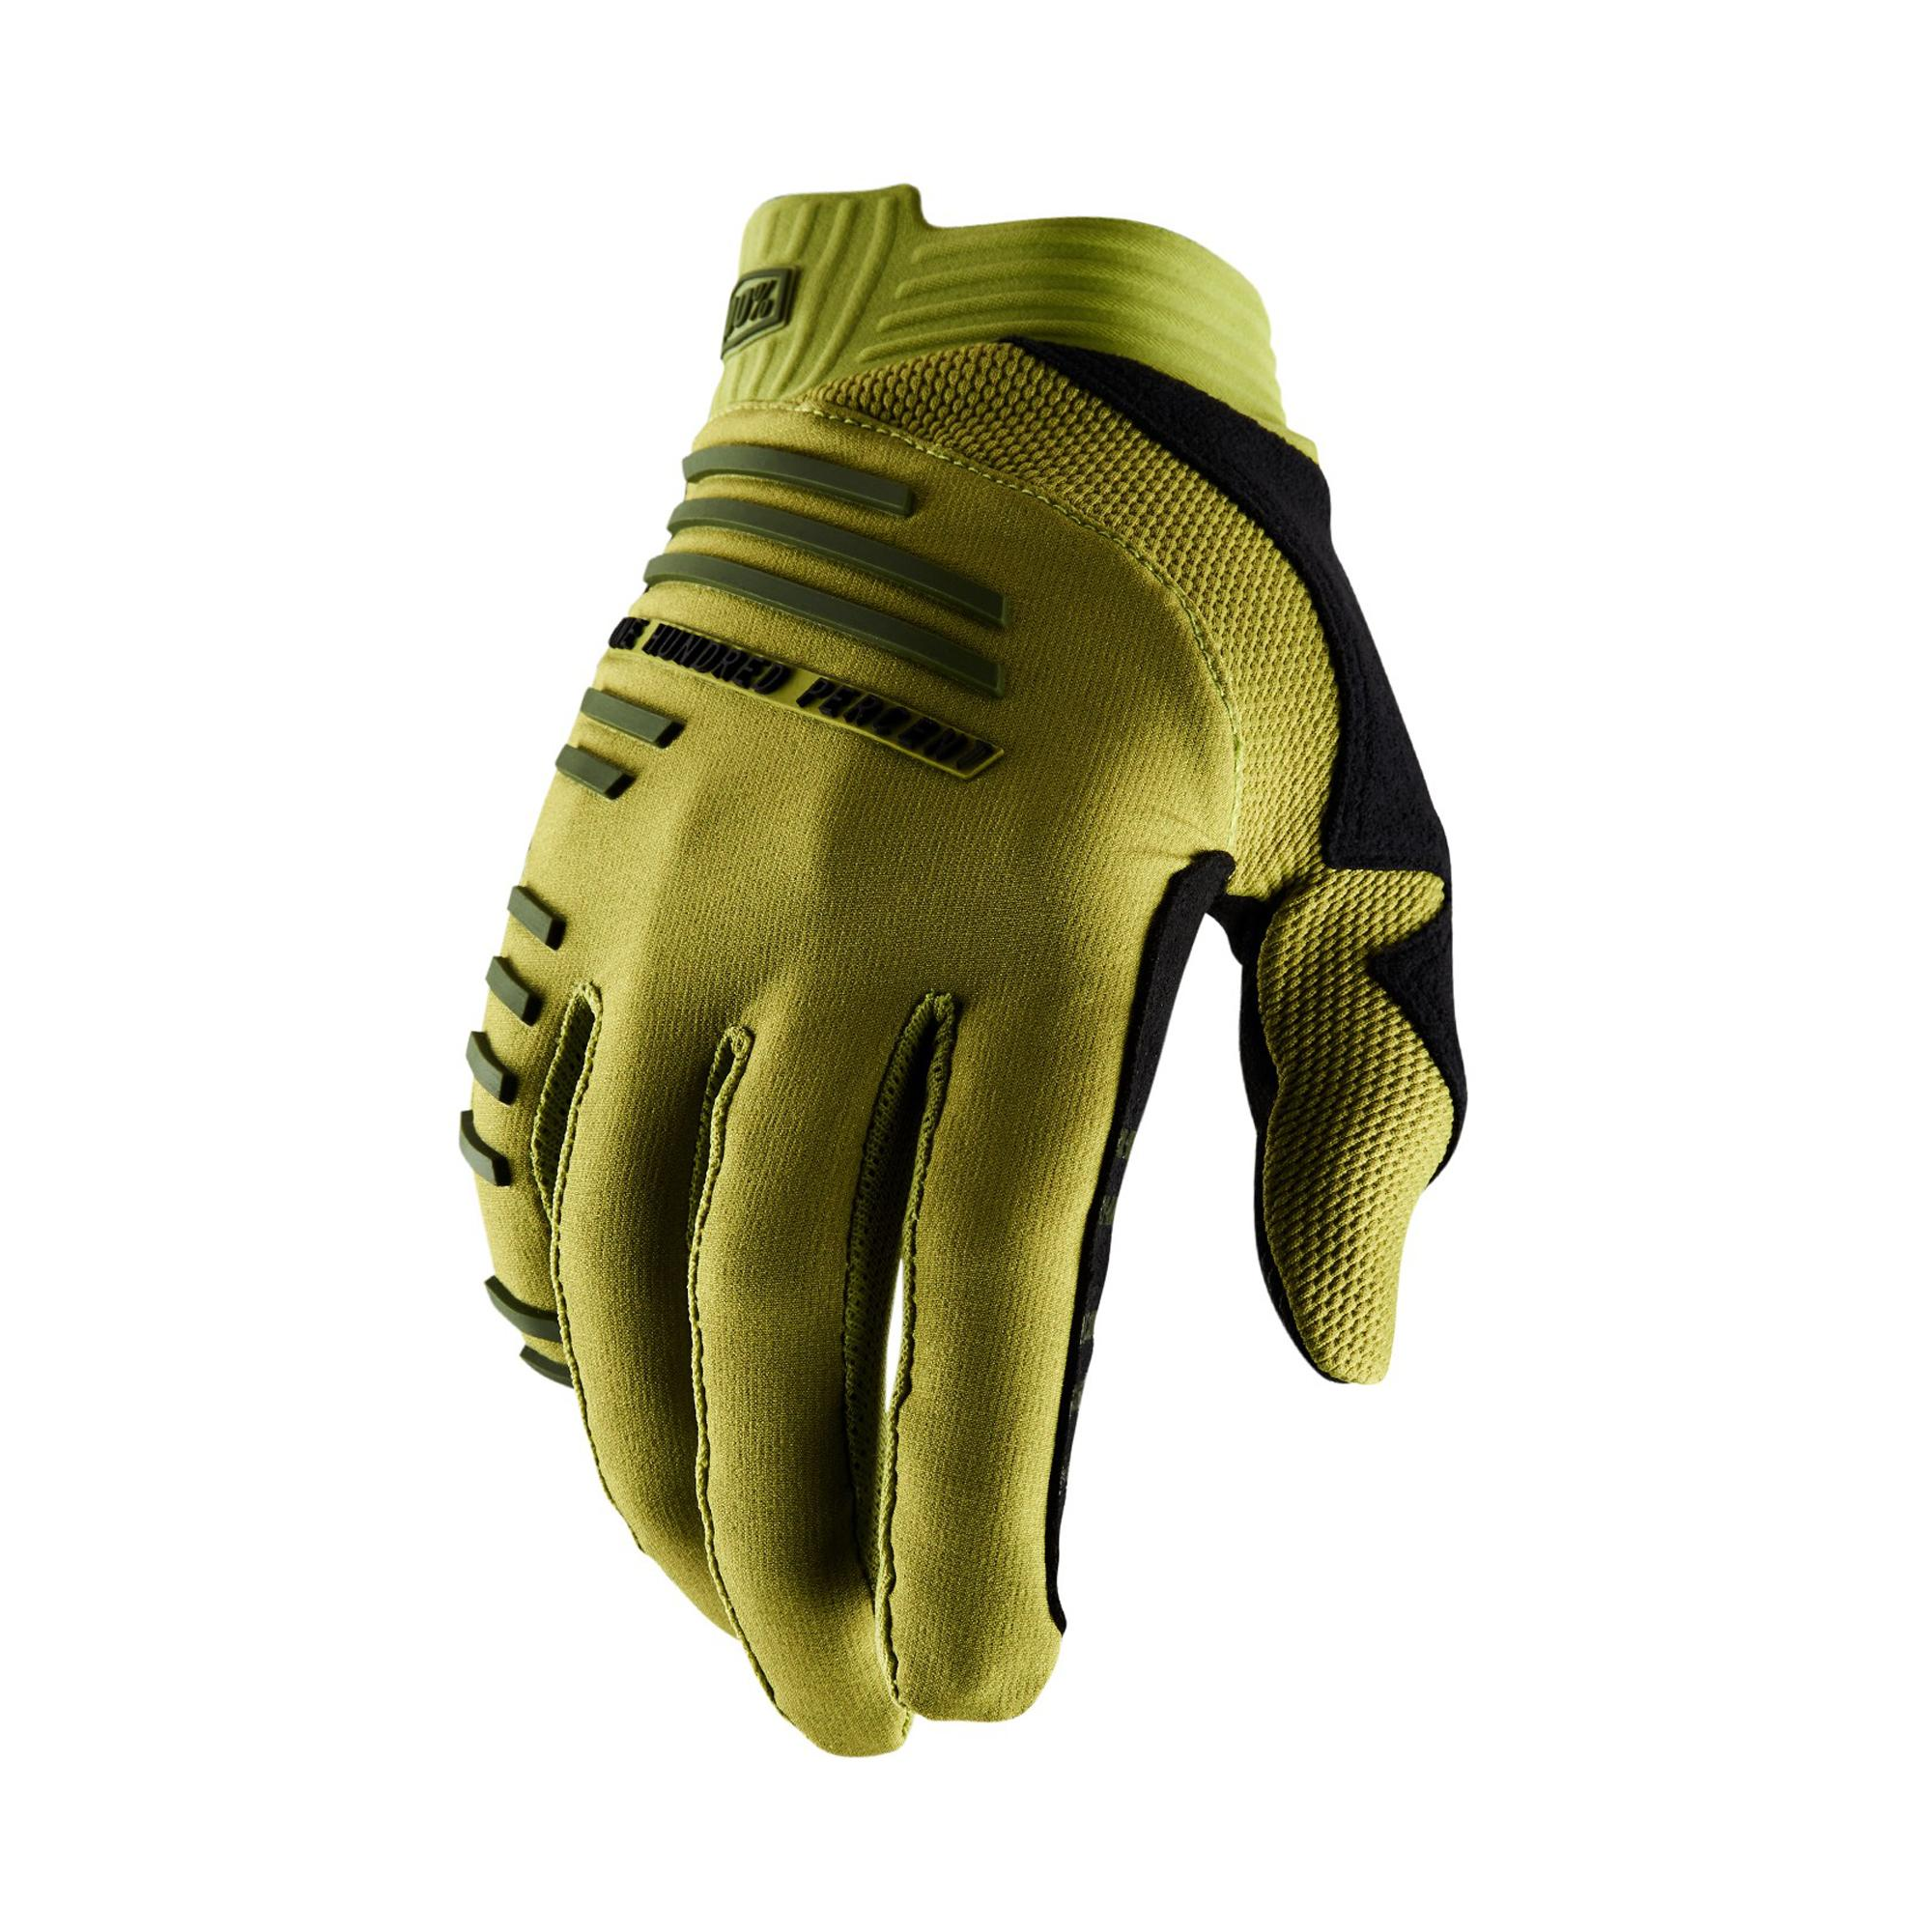 R-CORE Glove Olive -